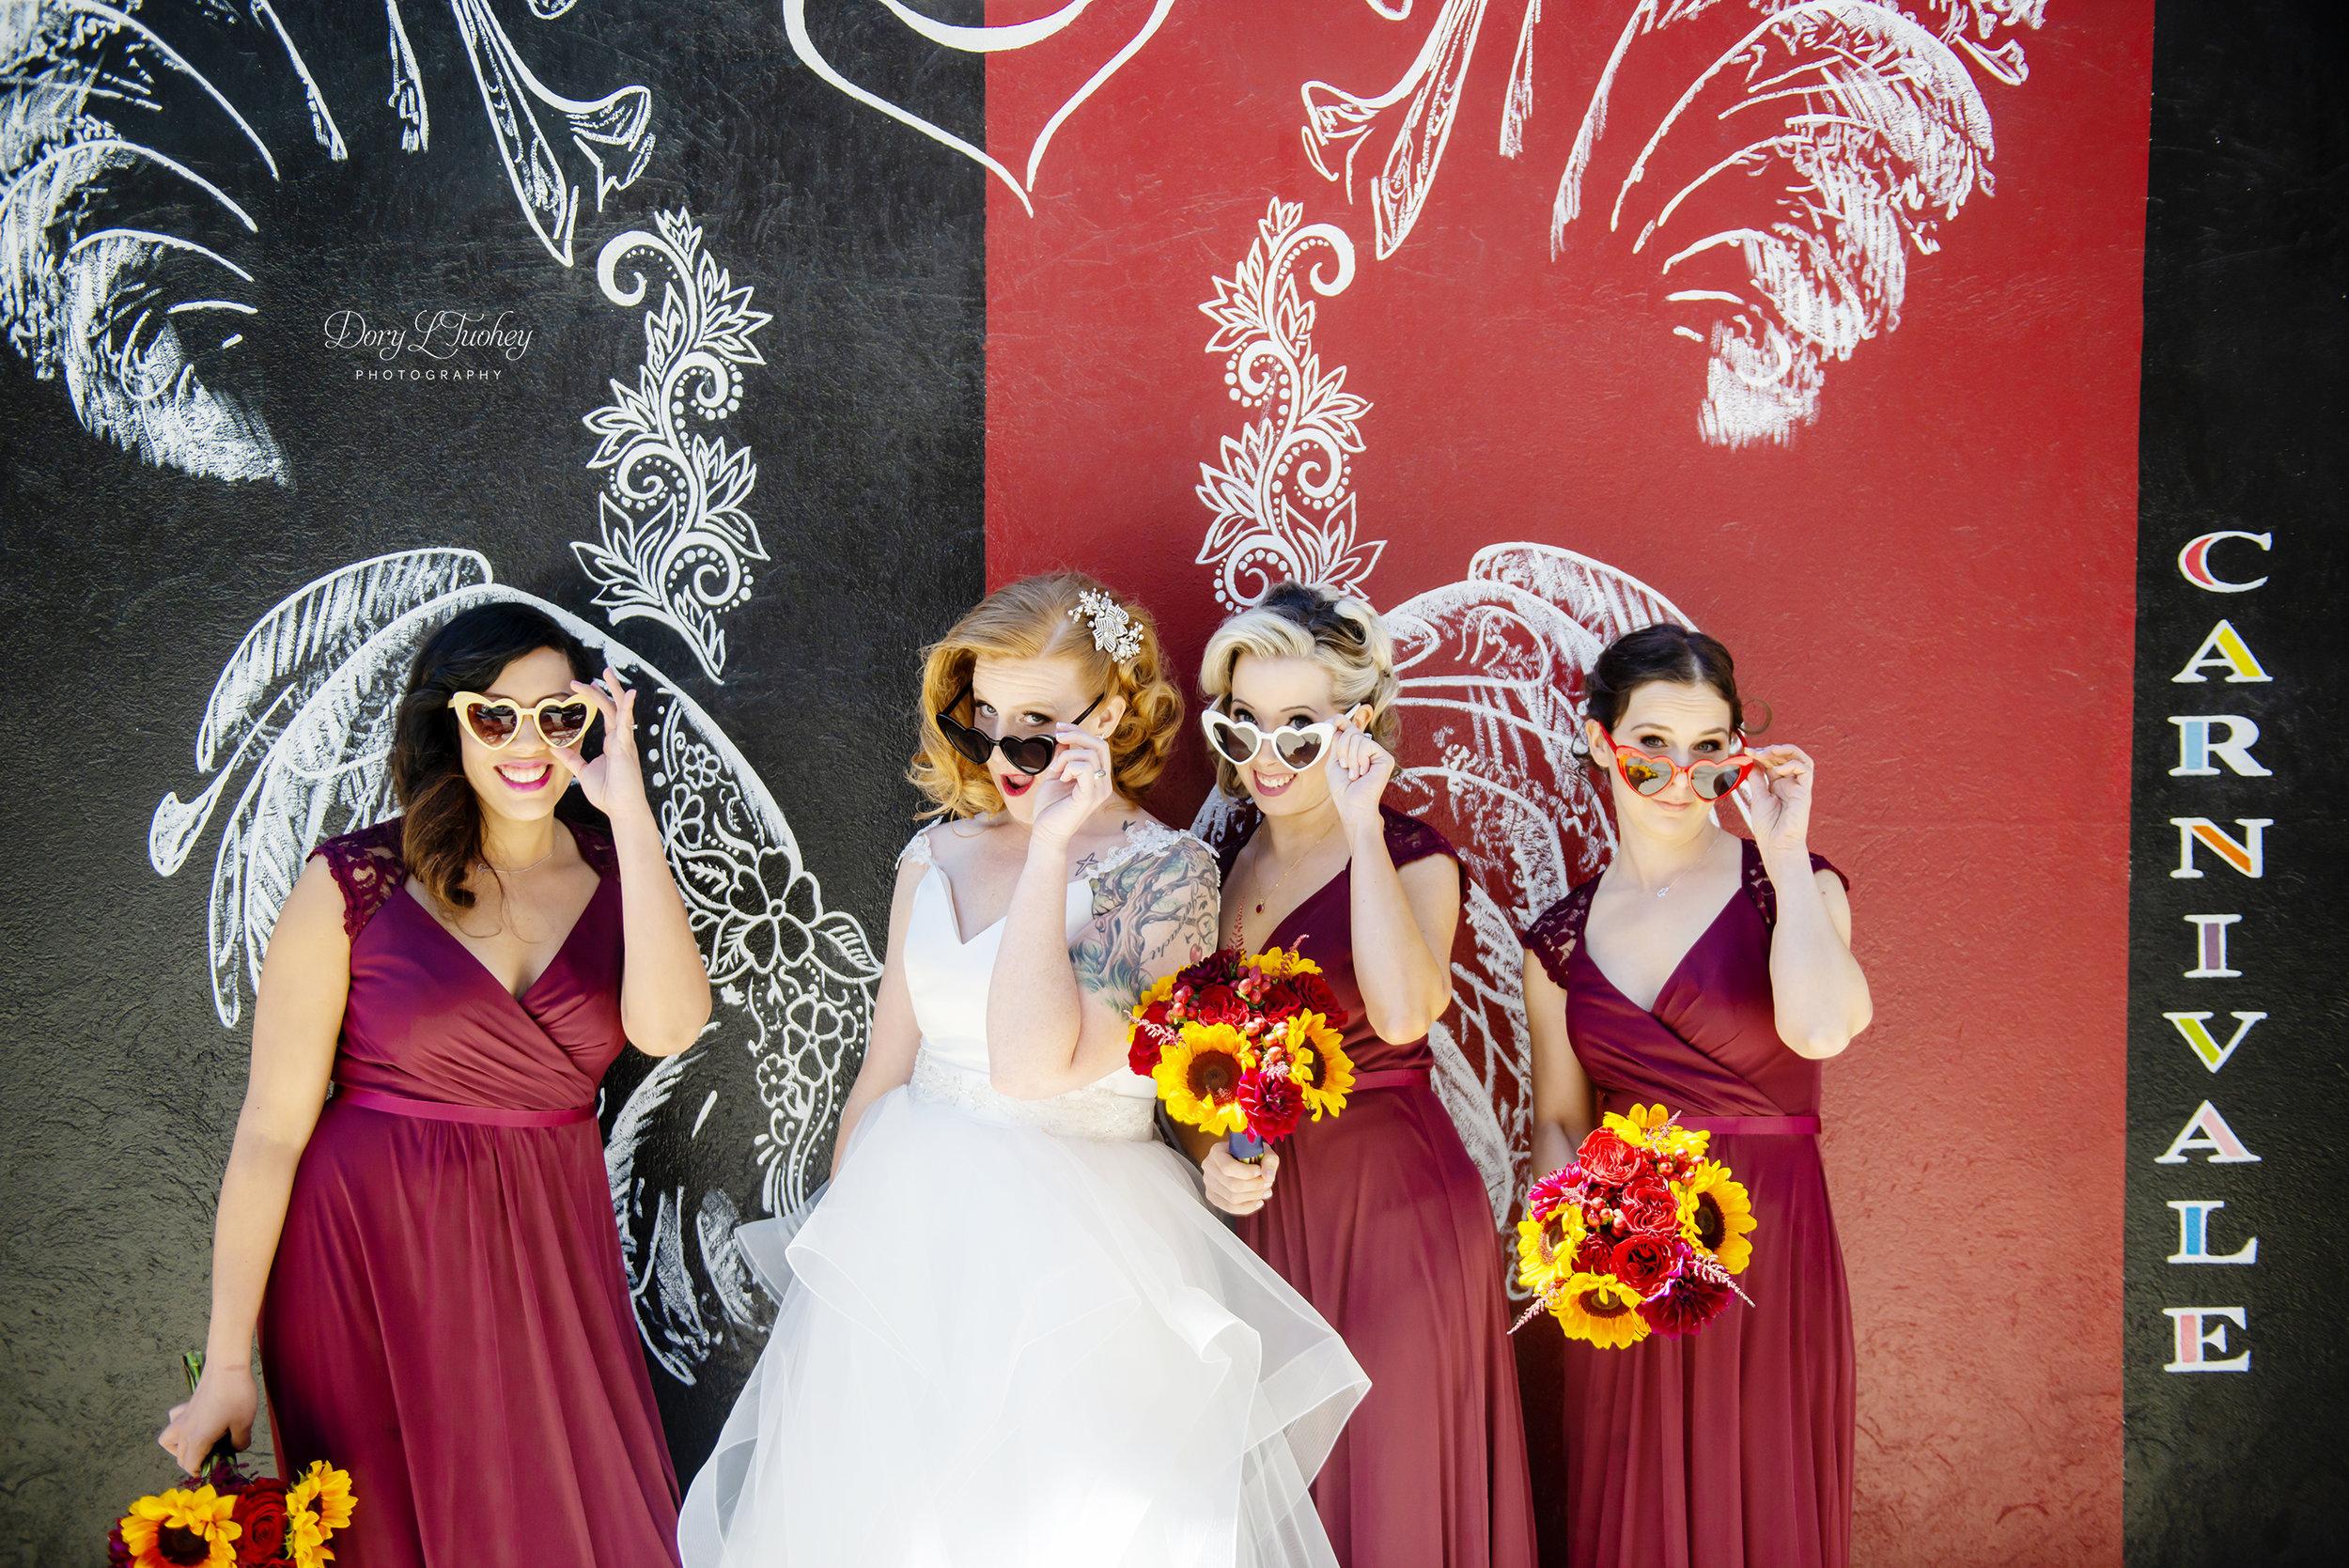 Carnivale_chicago_dory_wedding_vintage_bride_red_lips_paint_mural_groom_10.jpg